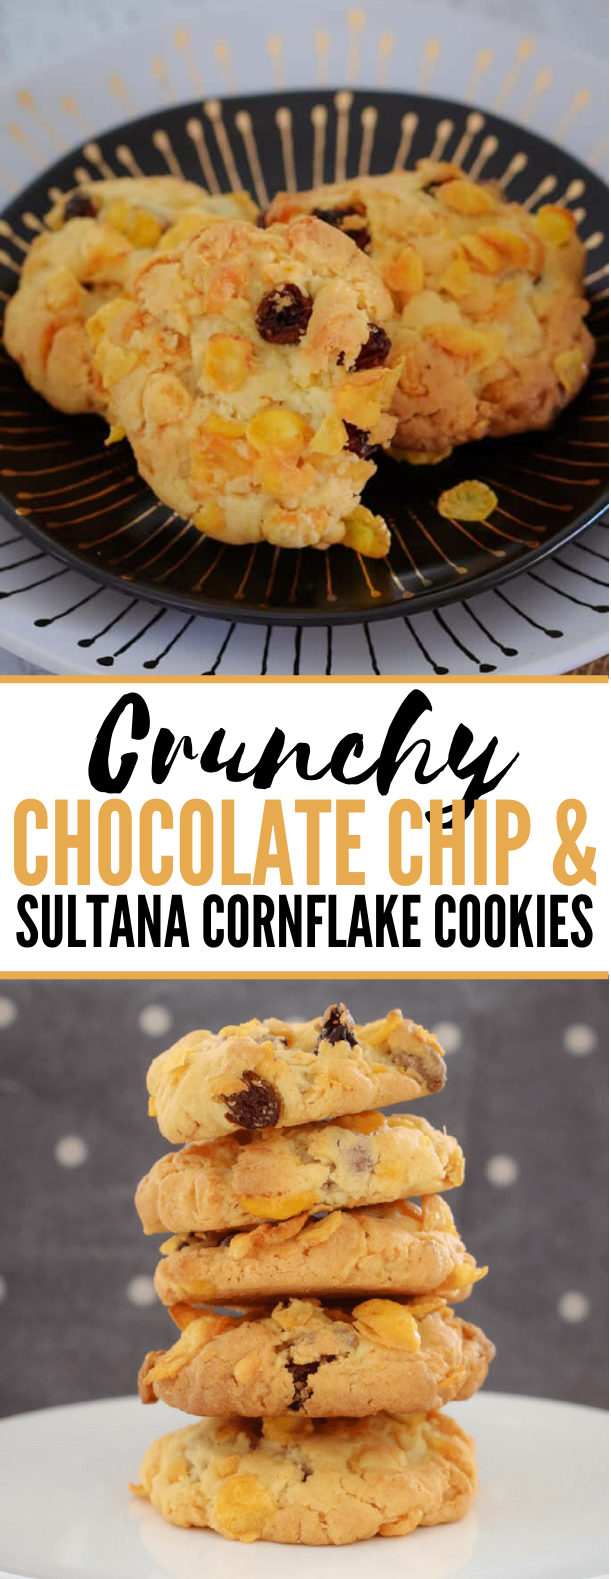 CRUNCHY CHOCOLATE CHIP & SULTANA CORNFLAKE COOKIES #desserts #kidfriendly